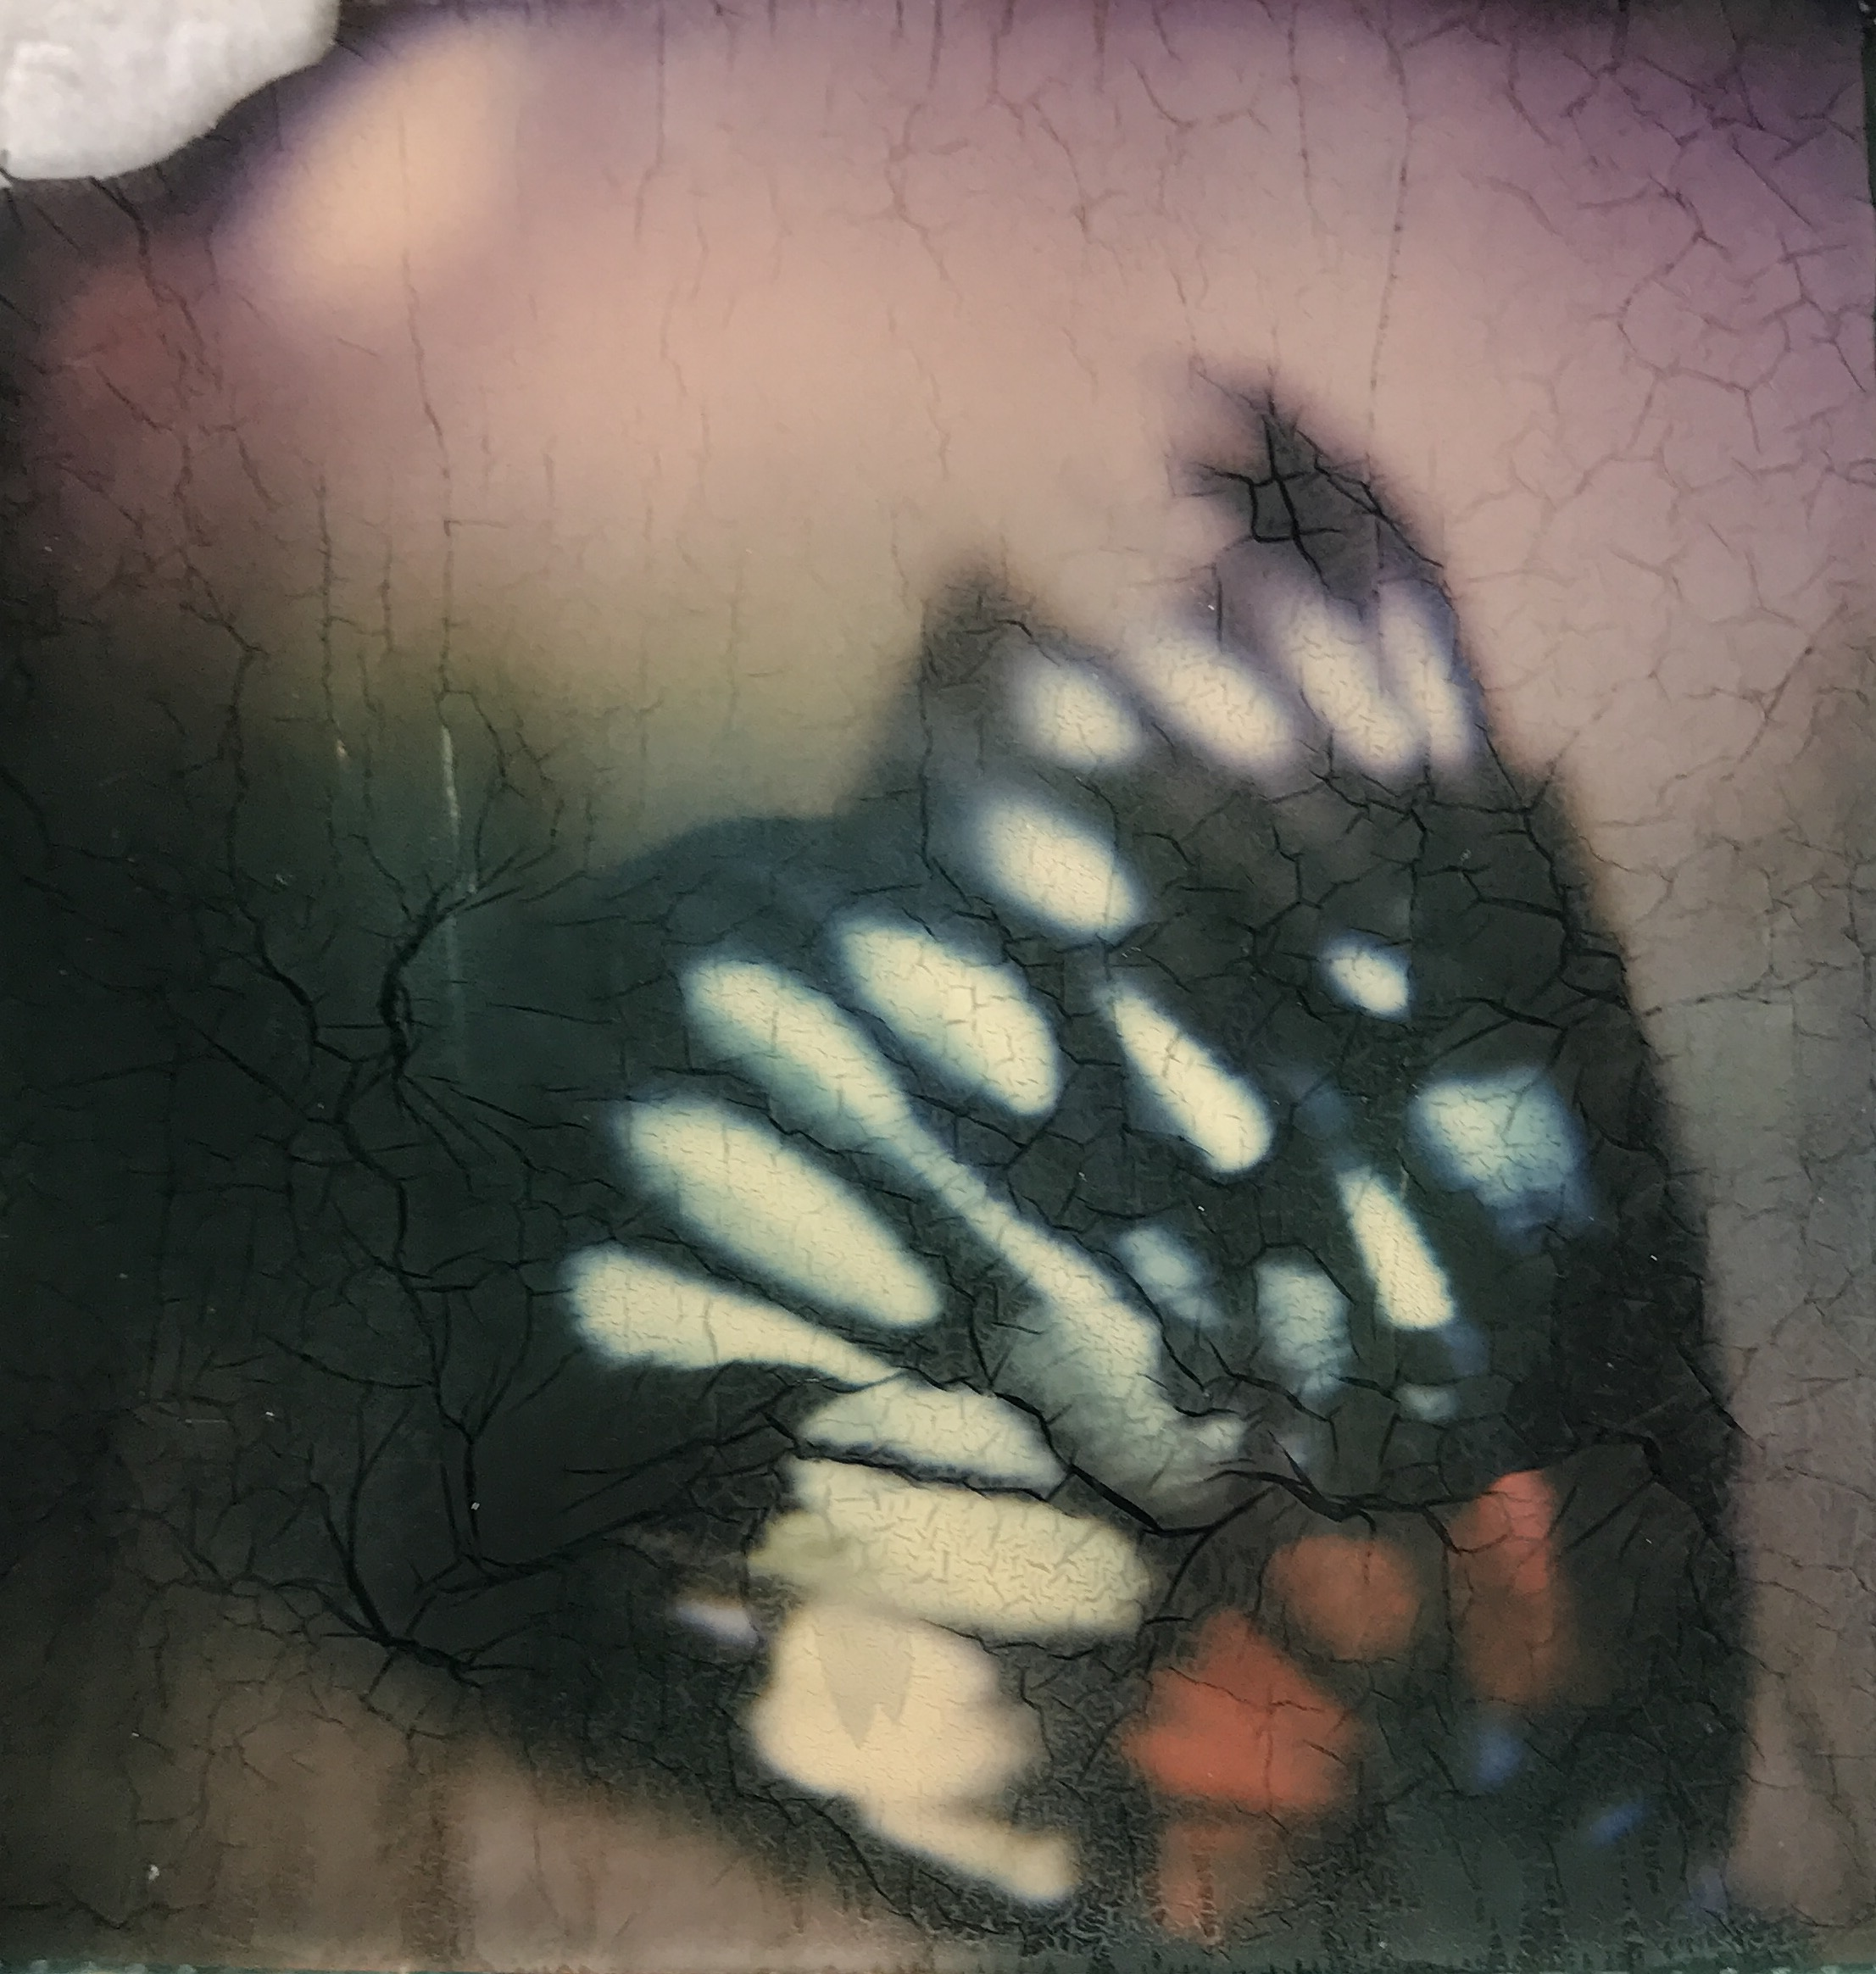 Untitled | MiNT SLR670  Polaroid Originals Color 600  Kin Ming Chan